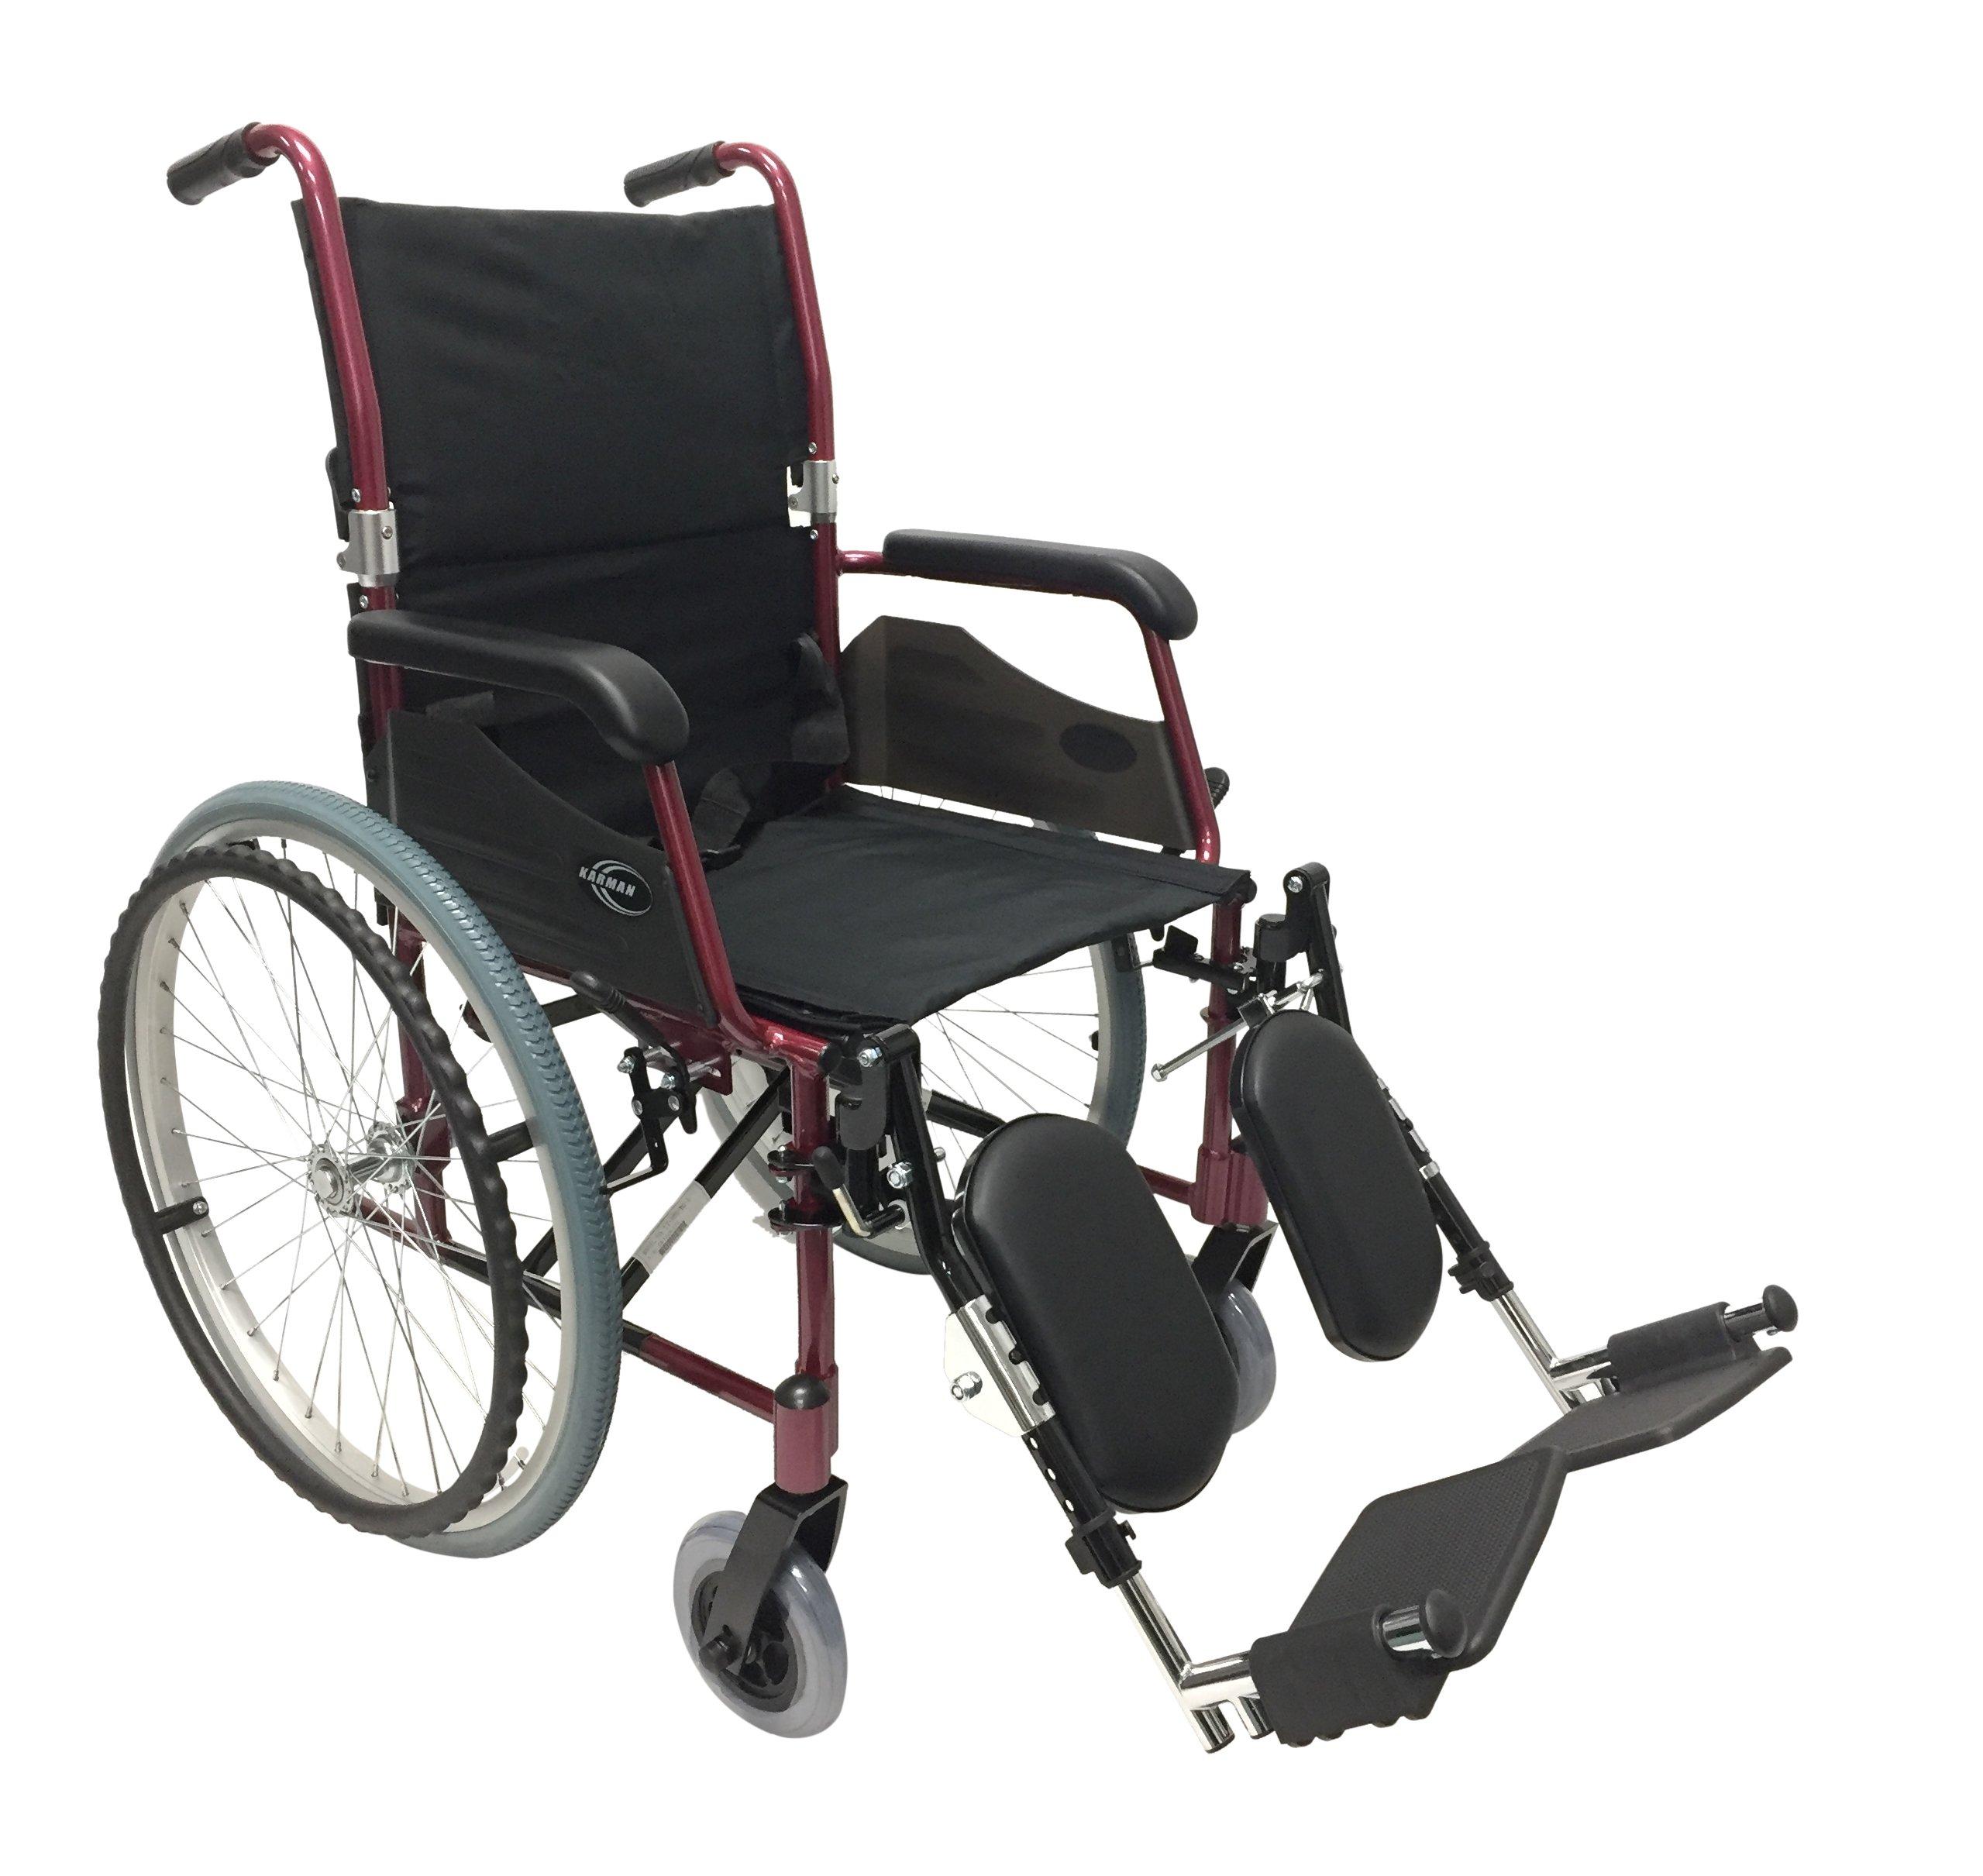 Karman 24 Pound Ultra Lightweight Wheelchair In Burgundy with Elevating Leg Rest